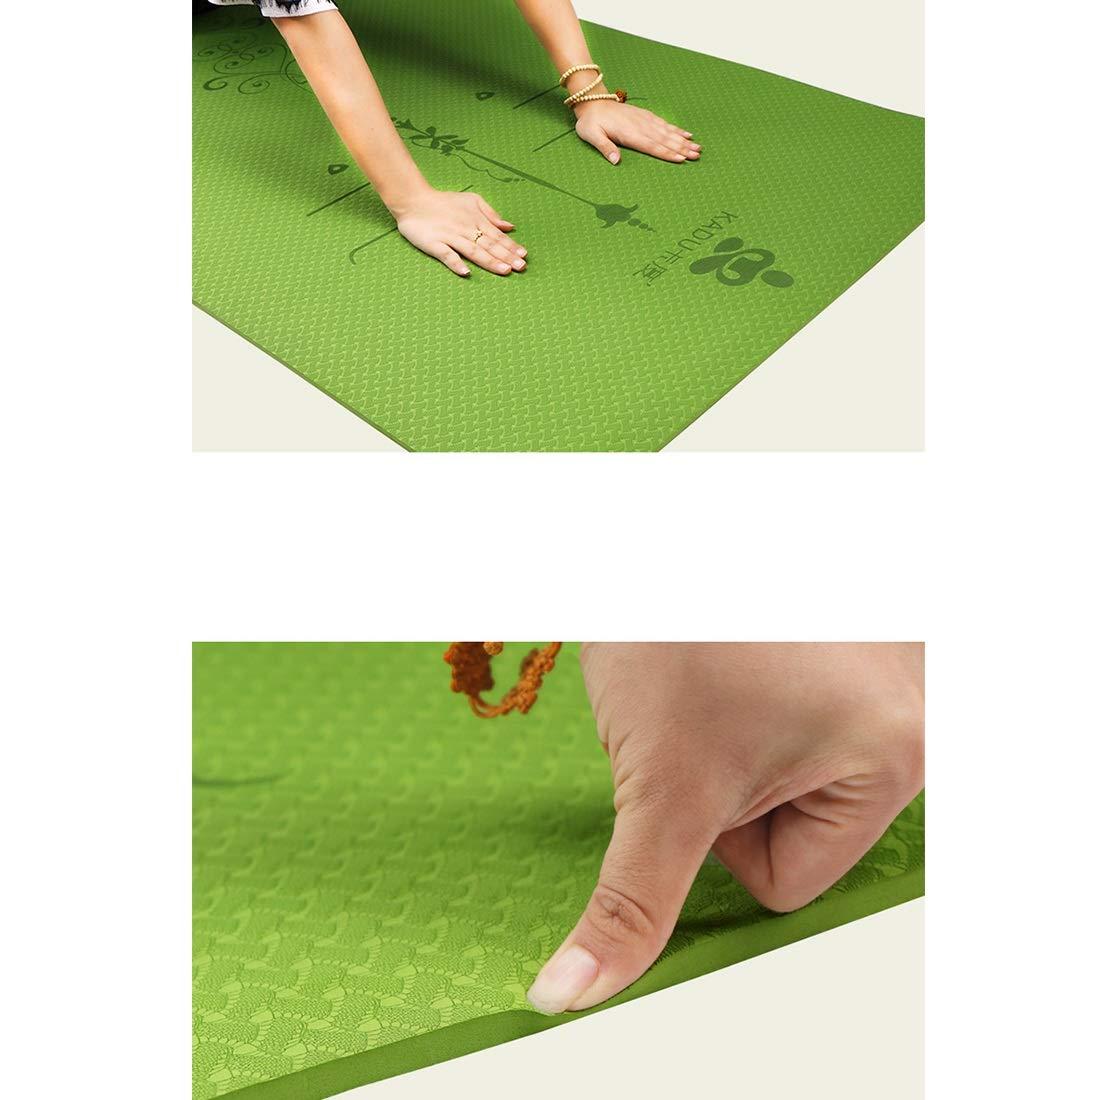 Liviana Alfombra de Yoga 6 / 8mm Gruesa Extra Grande 72X 24 / 72X 31.5 para Ejercicios de Ejercicios de Yoga Pilates ecológica FELICIGG Colchoneta de Yoga con Correa Antideslizante